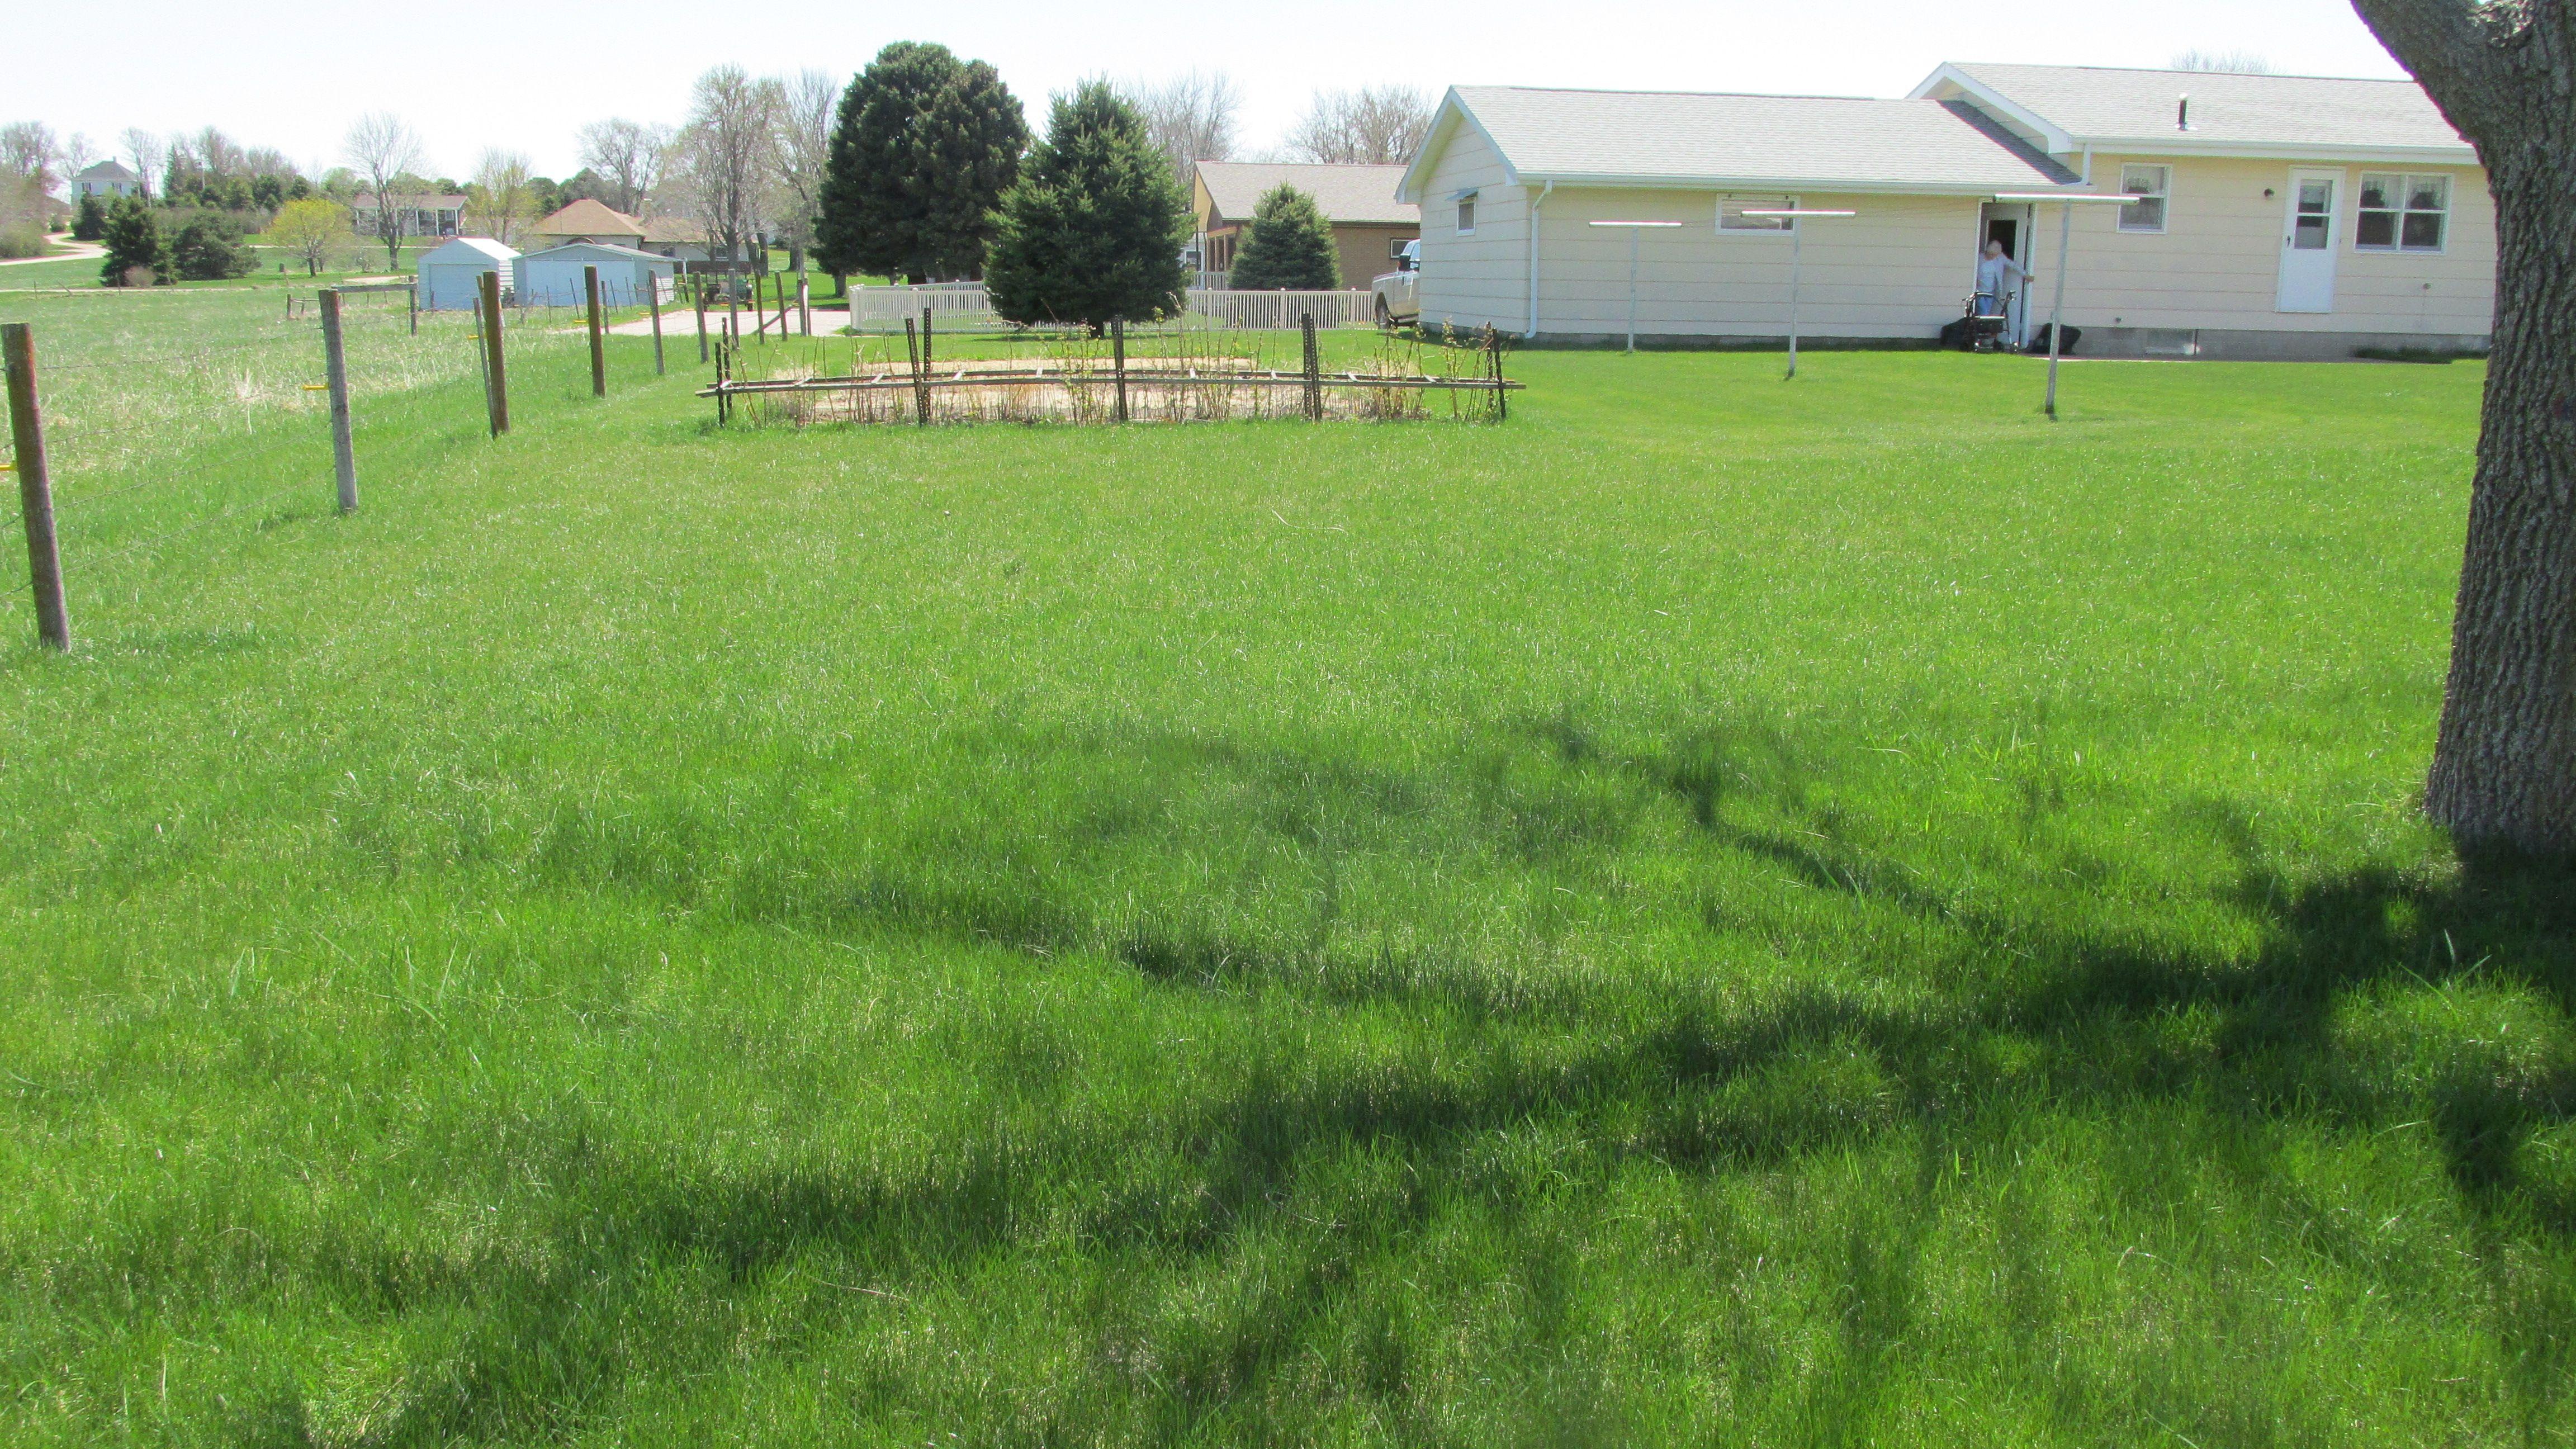 North lawn